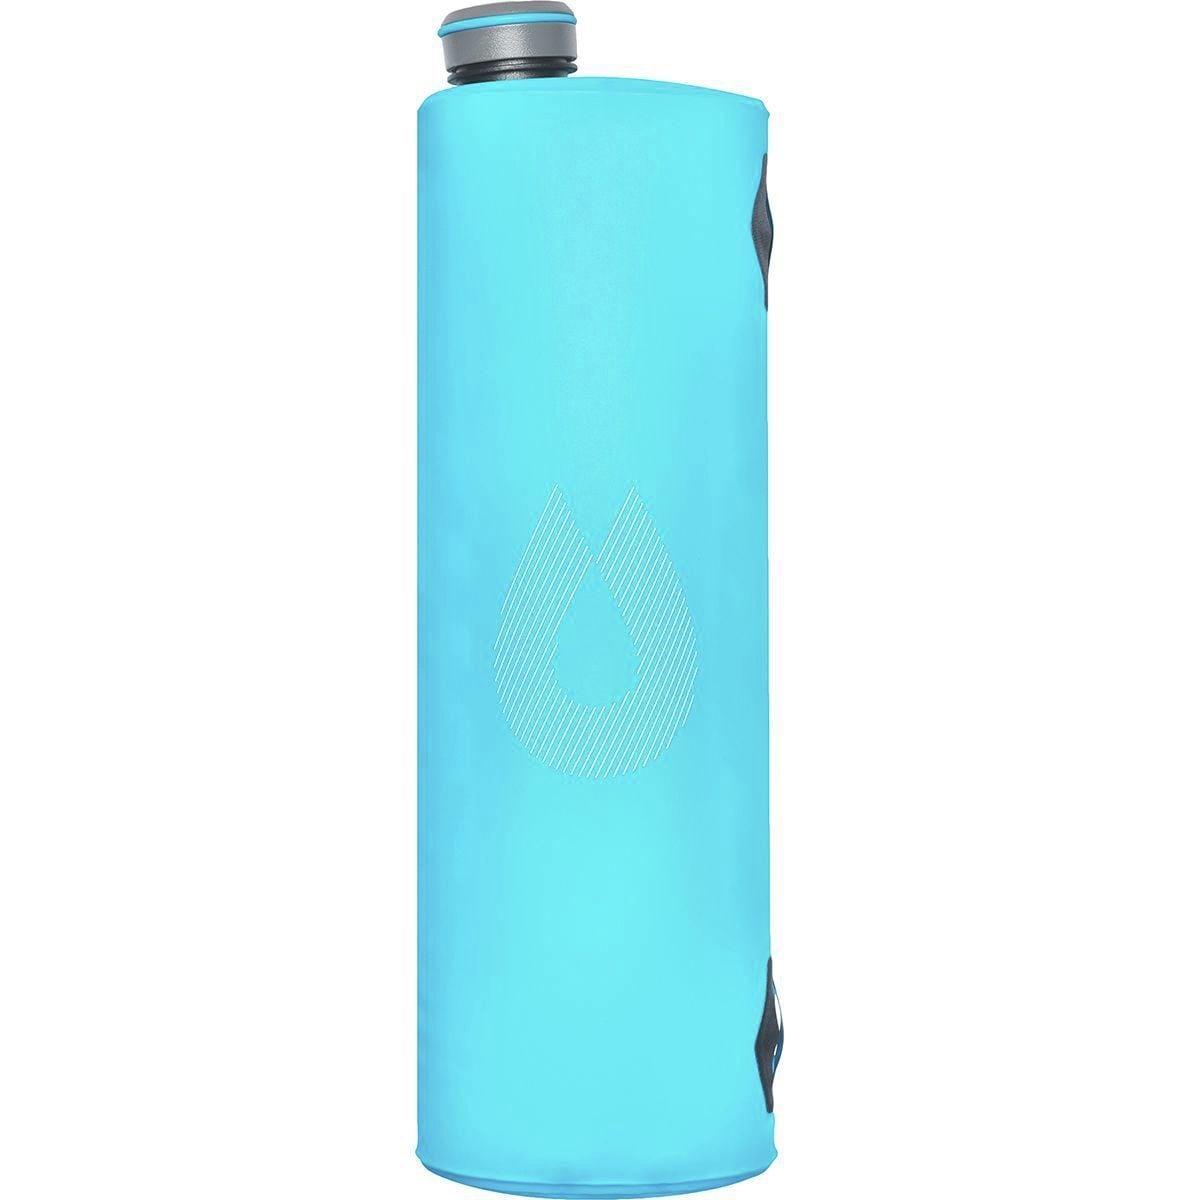 Hydrapak Seeker Collapsible Water Storage Flask